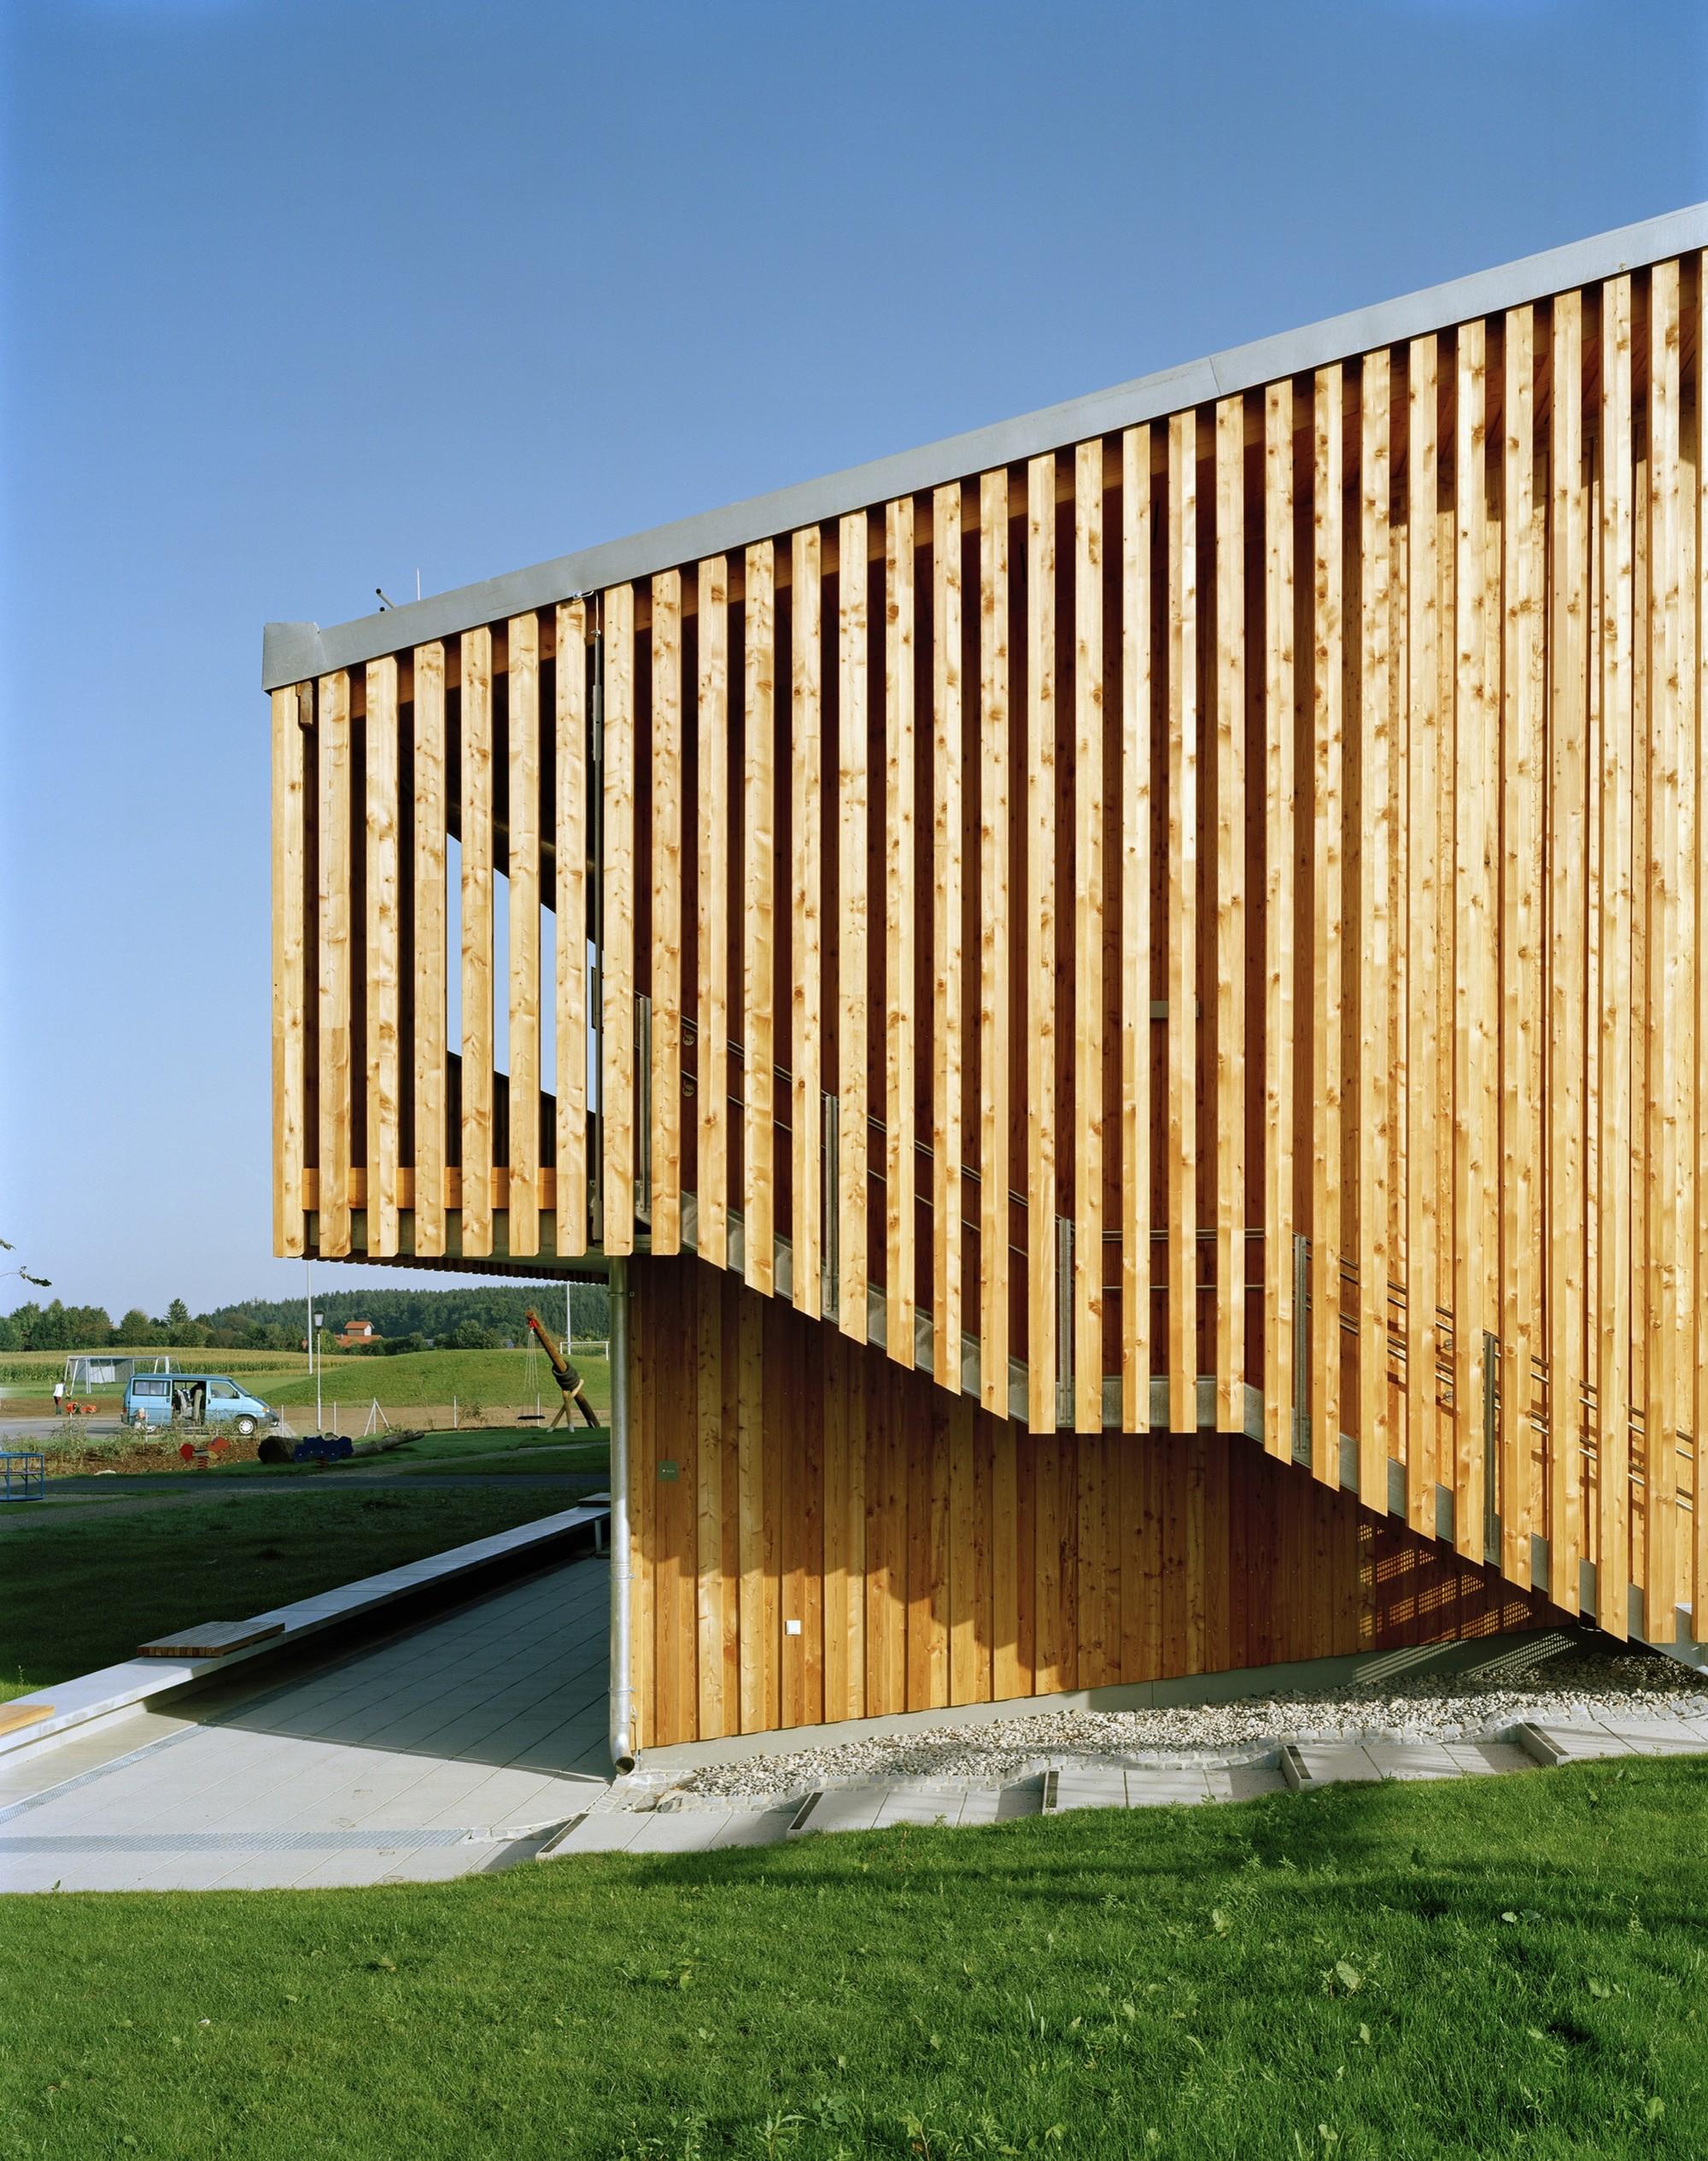 gallery of kindergarten aying allmann sattler wappner architekten 4. Black Bedroom Furniture Sets. Home Design Ideas